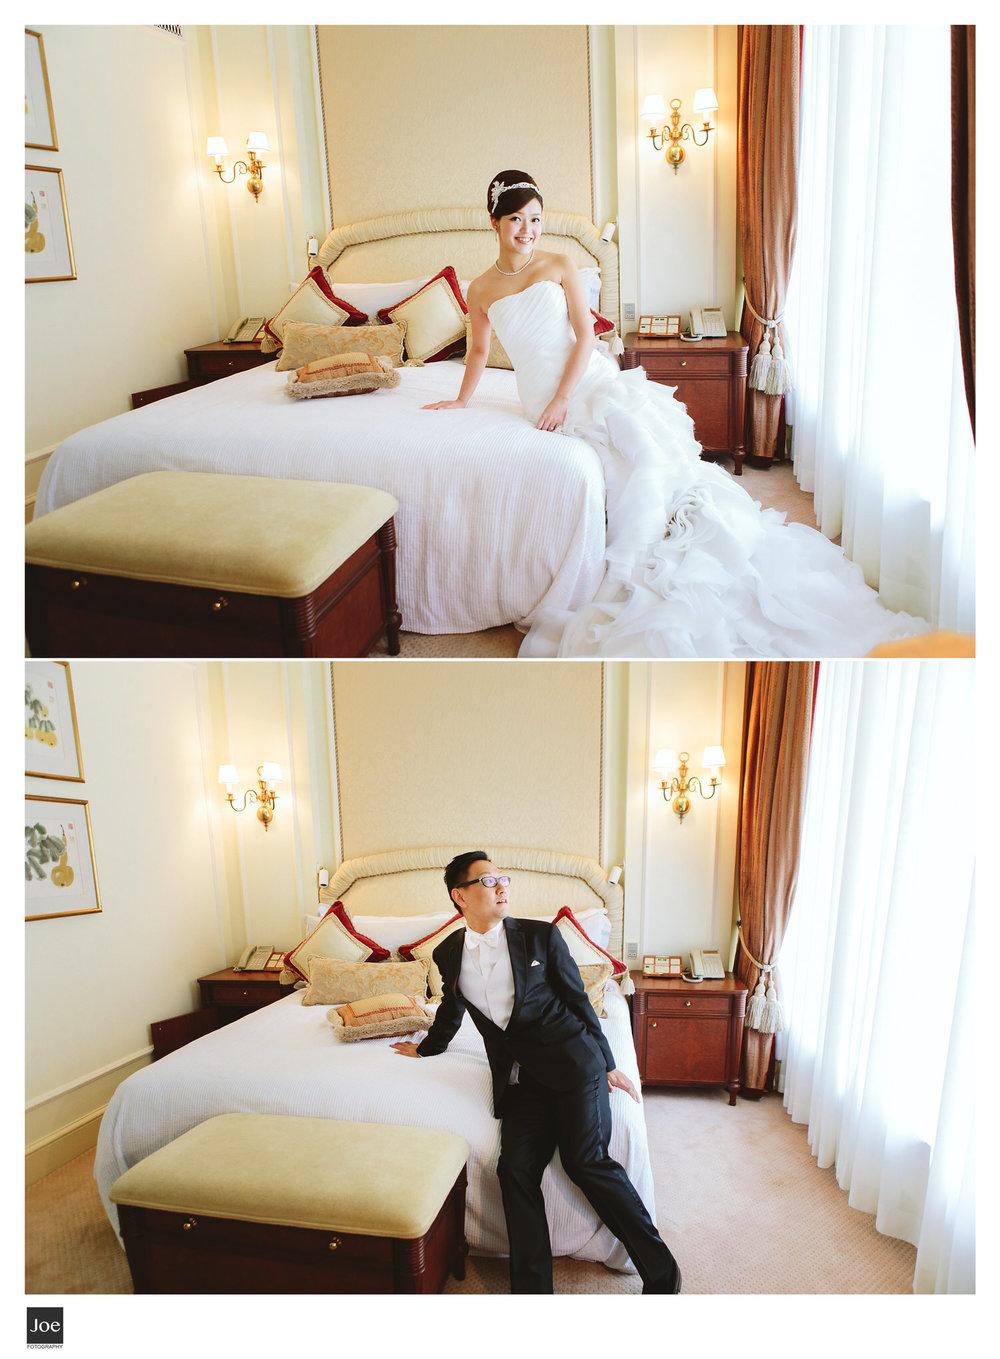 joefotography-hongkong-peninsula-wedding-eva-samuel-37.jpg